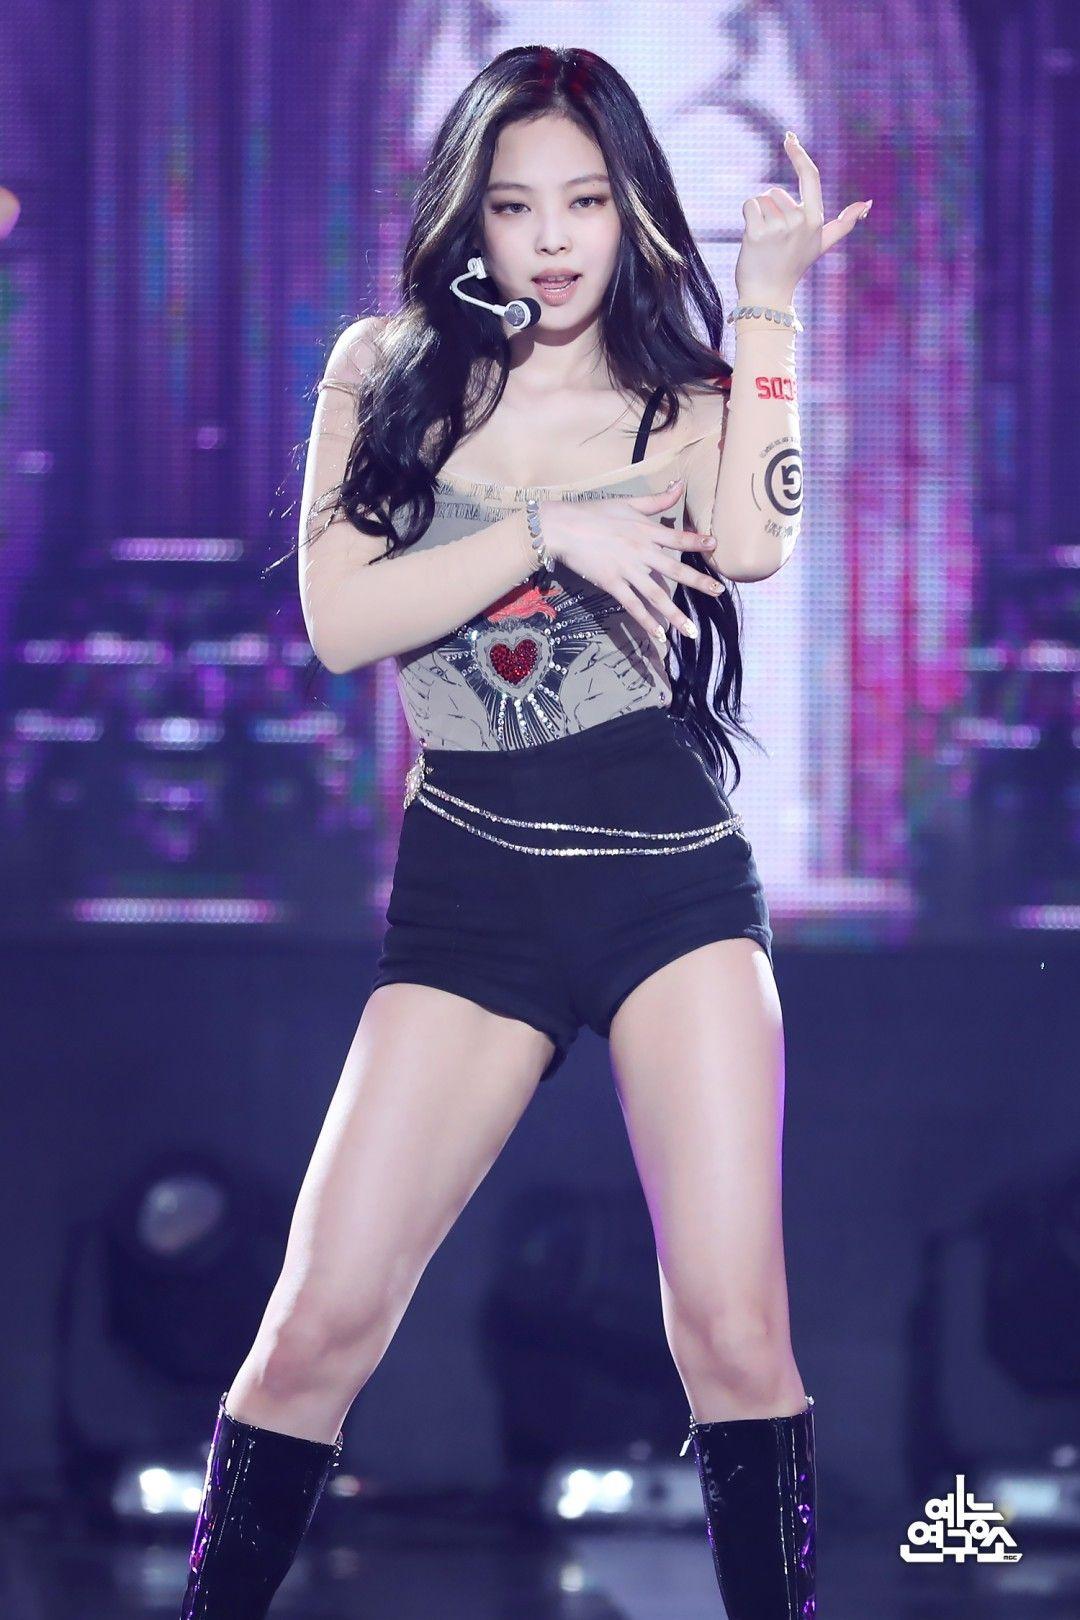 Blackpinkofficial Music Show 200718 Jennie Show Music Core Blackpink Fashion Blackpink Jennie Blackpink